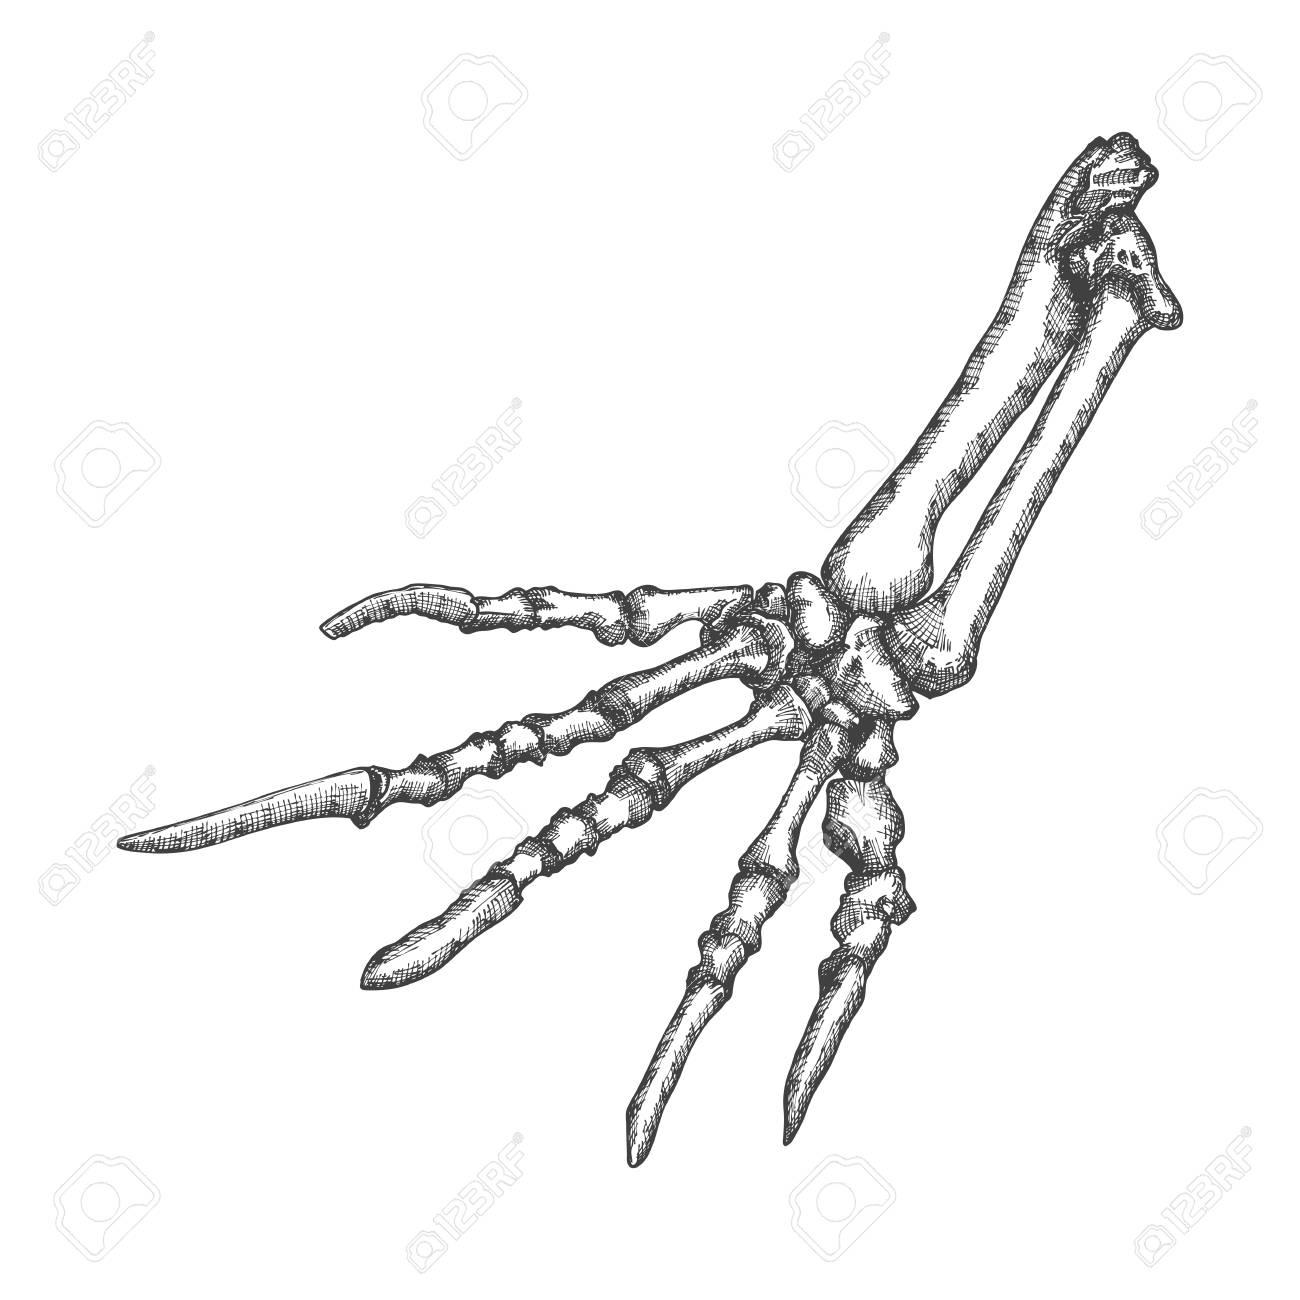 Stylized Drawing Lizard Bones Of The Hand Decorative Drawn Skeleton